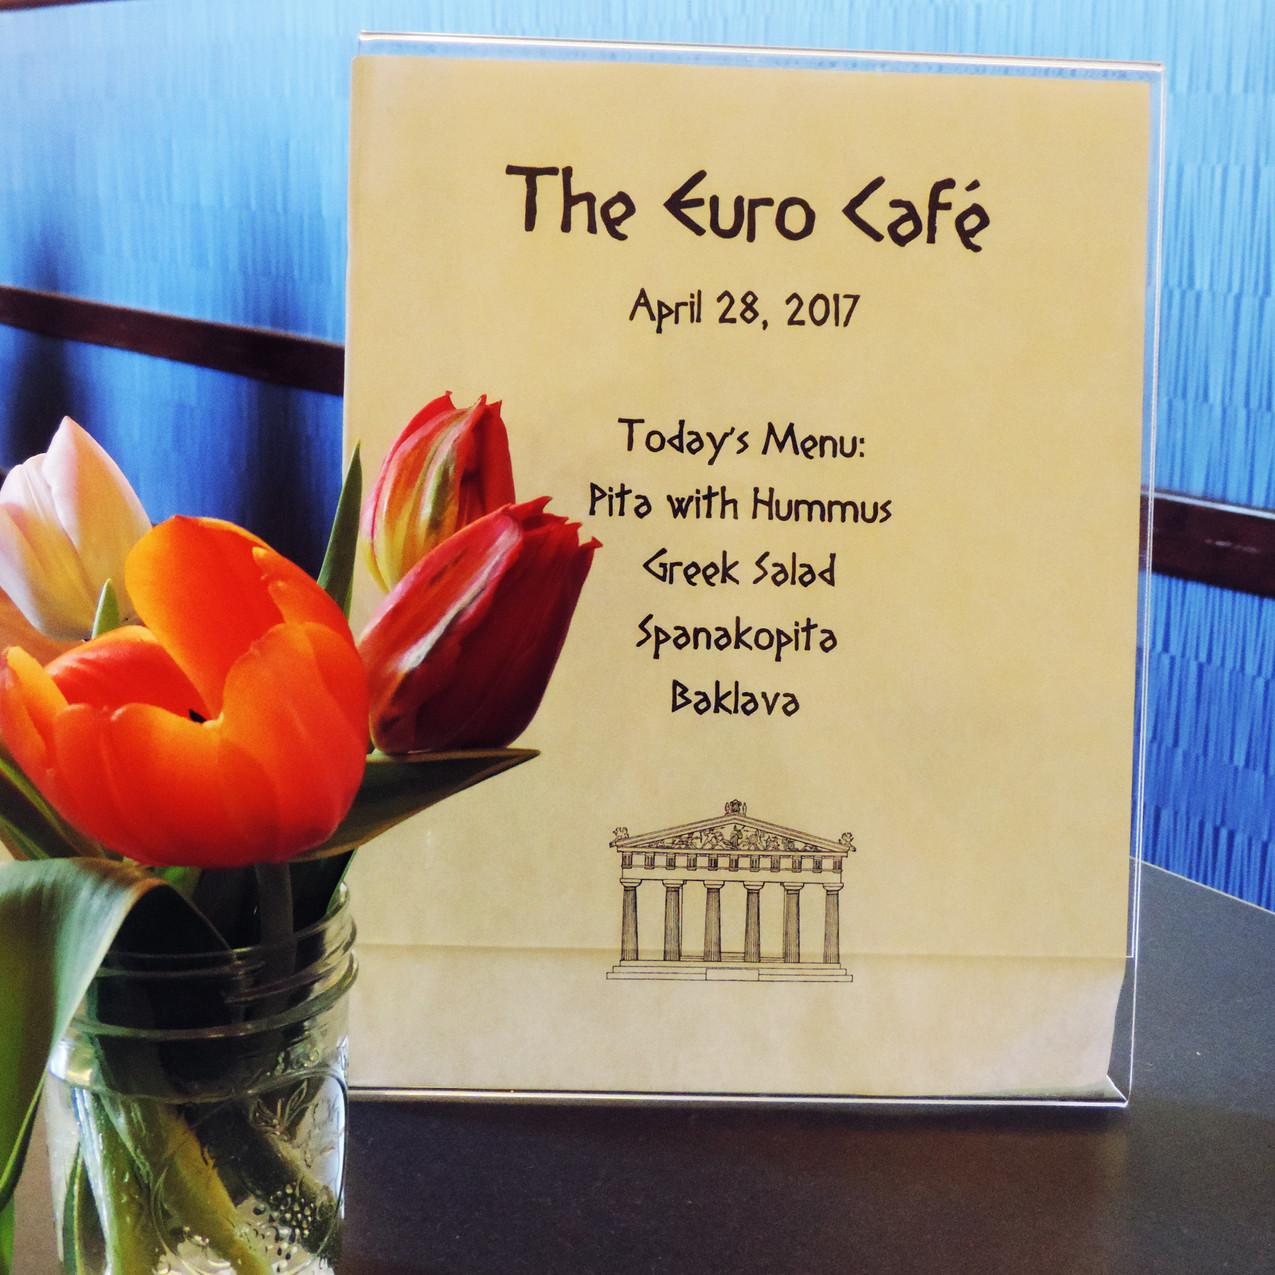 The Euro Cafe